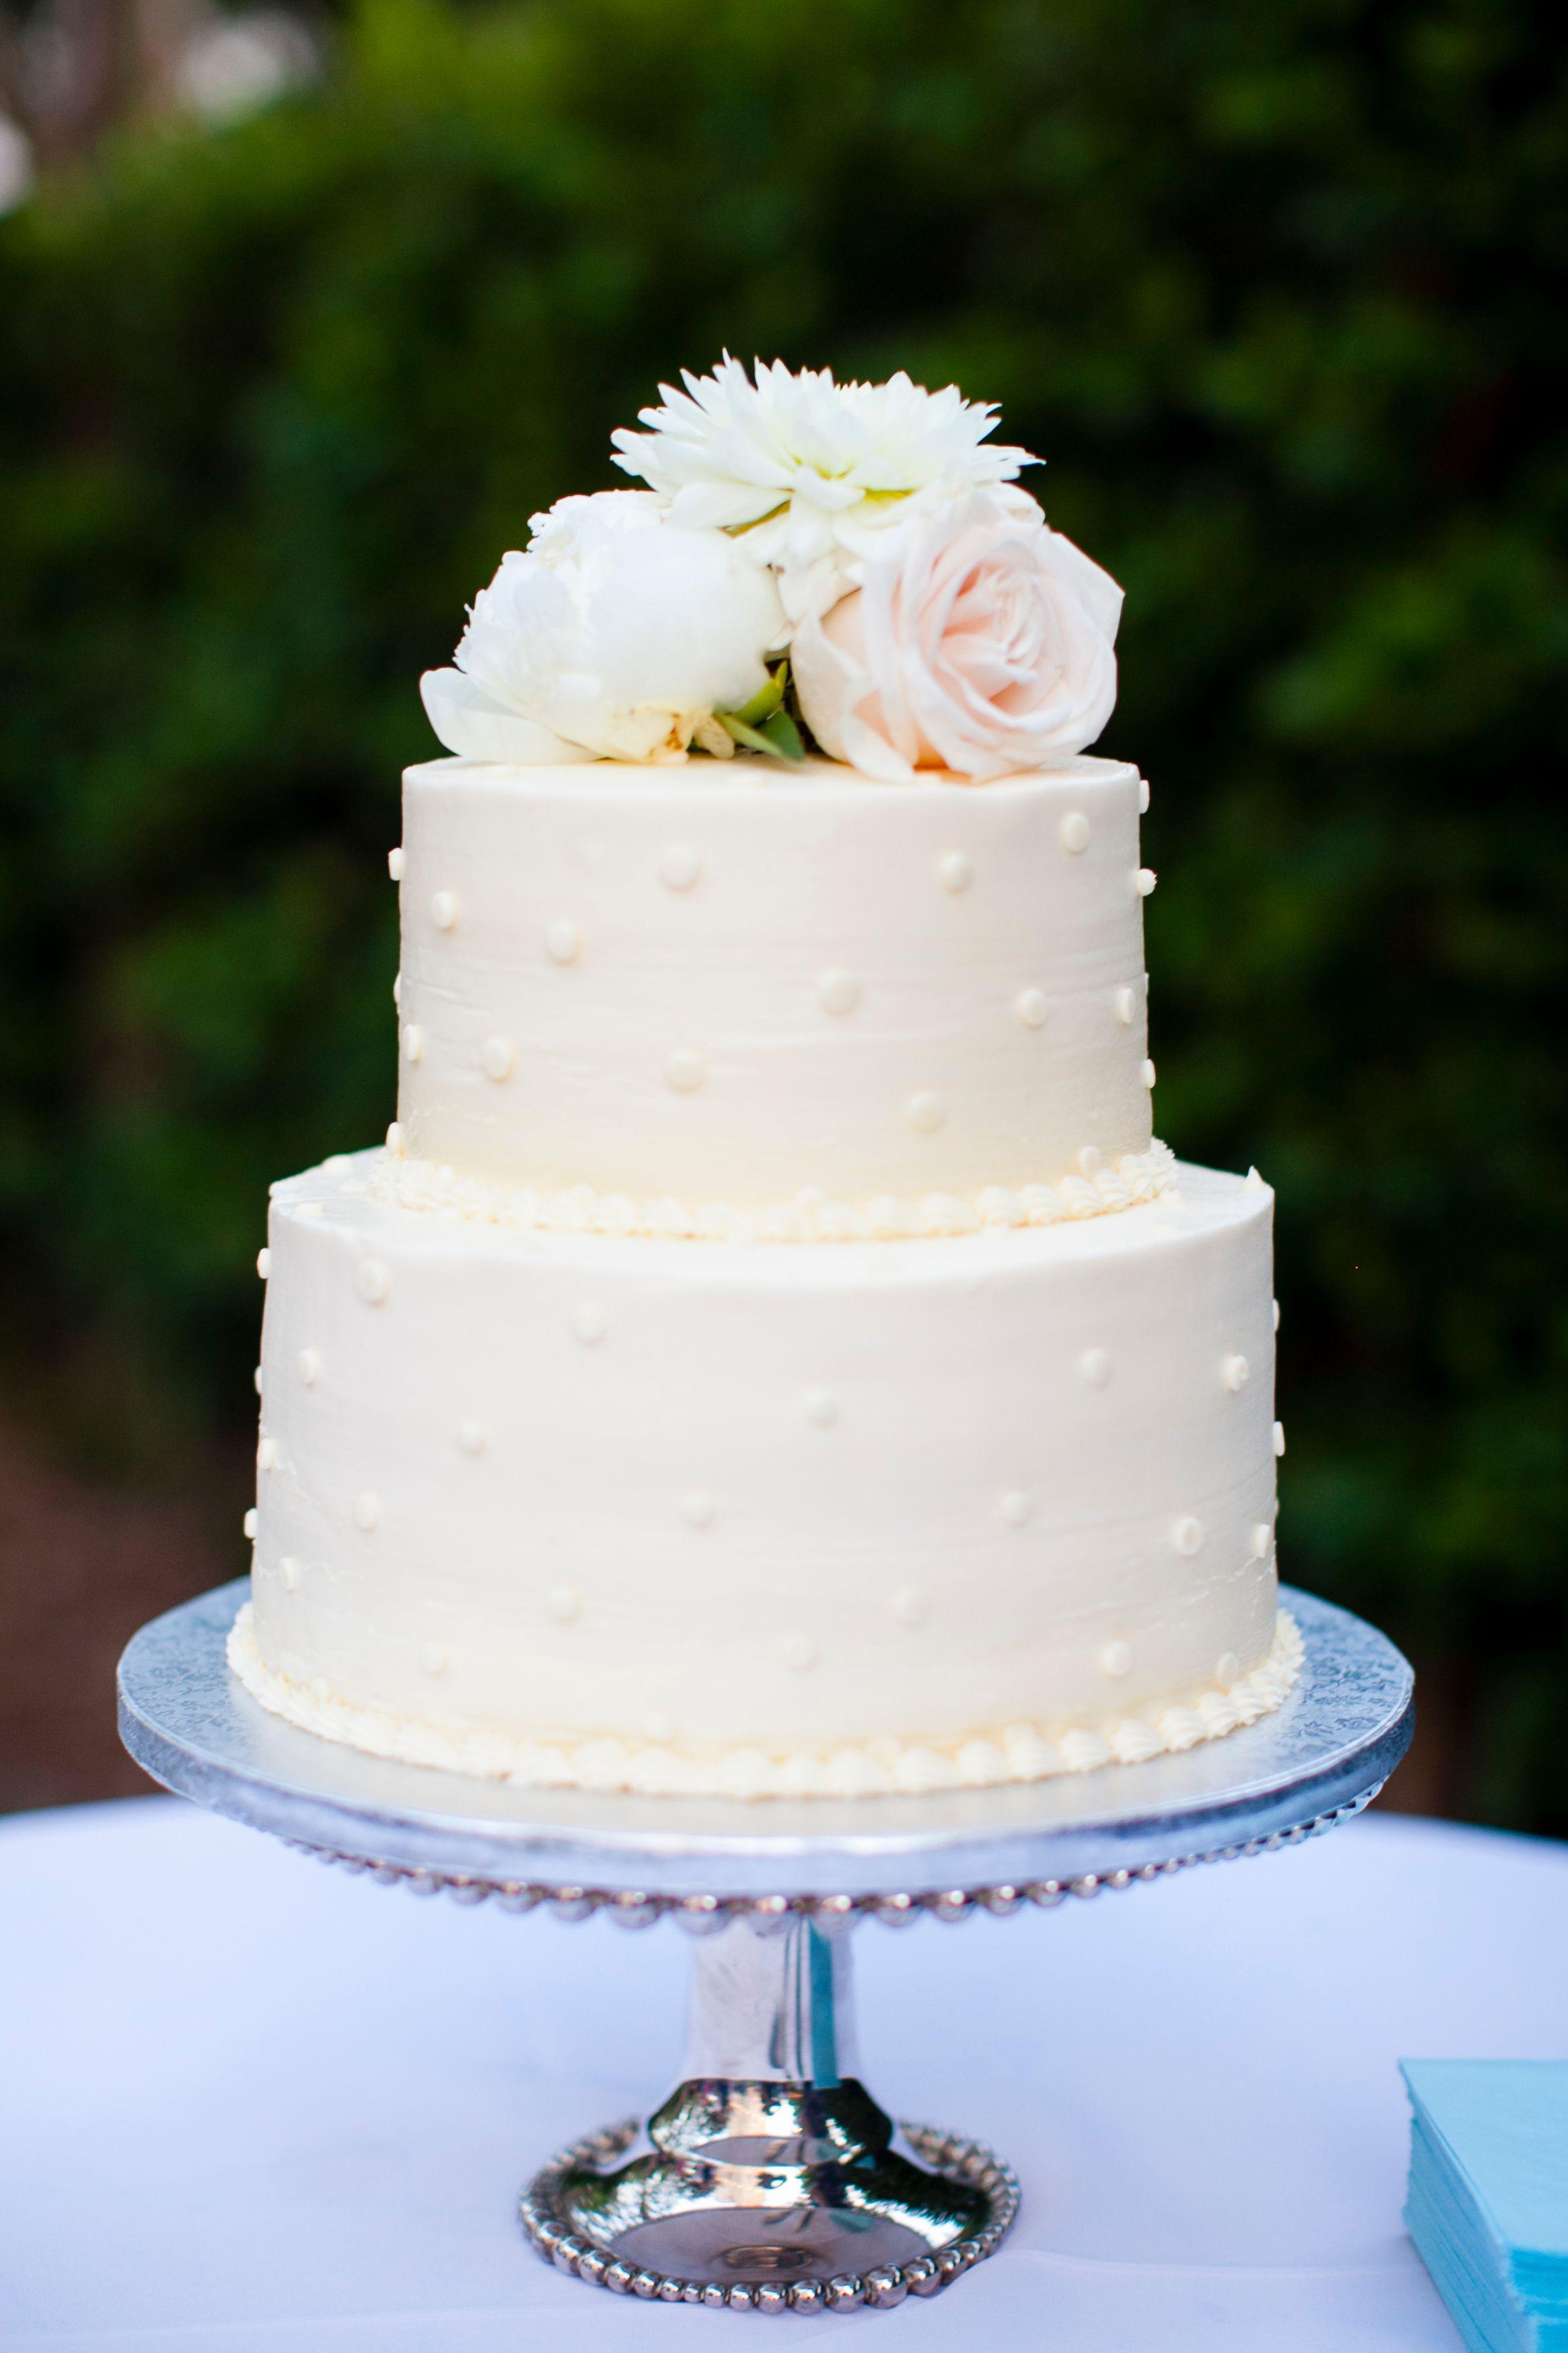 Wedding Cakes 2 Tier  Two Tier Polka Dot Buttercream Wedding Cake … Cakes